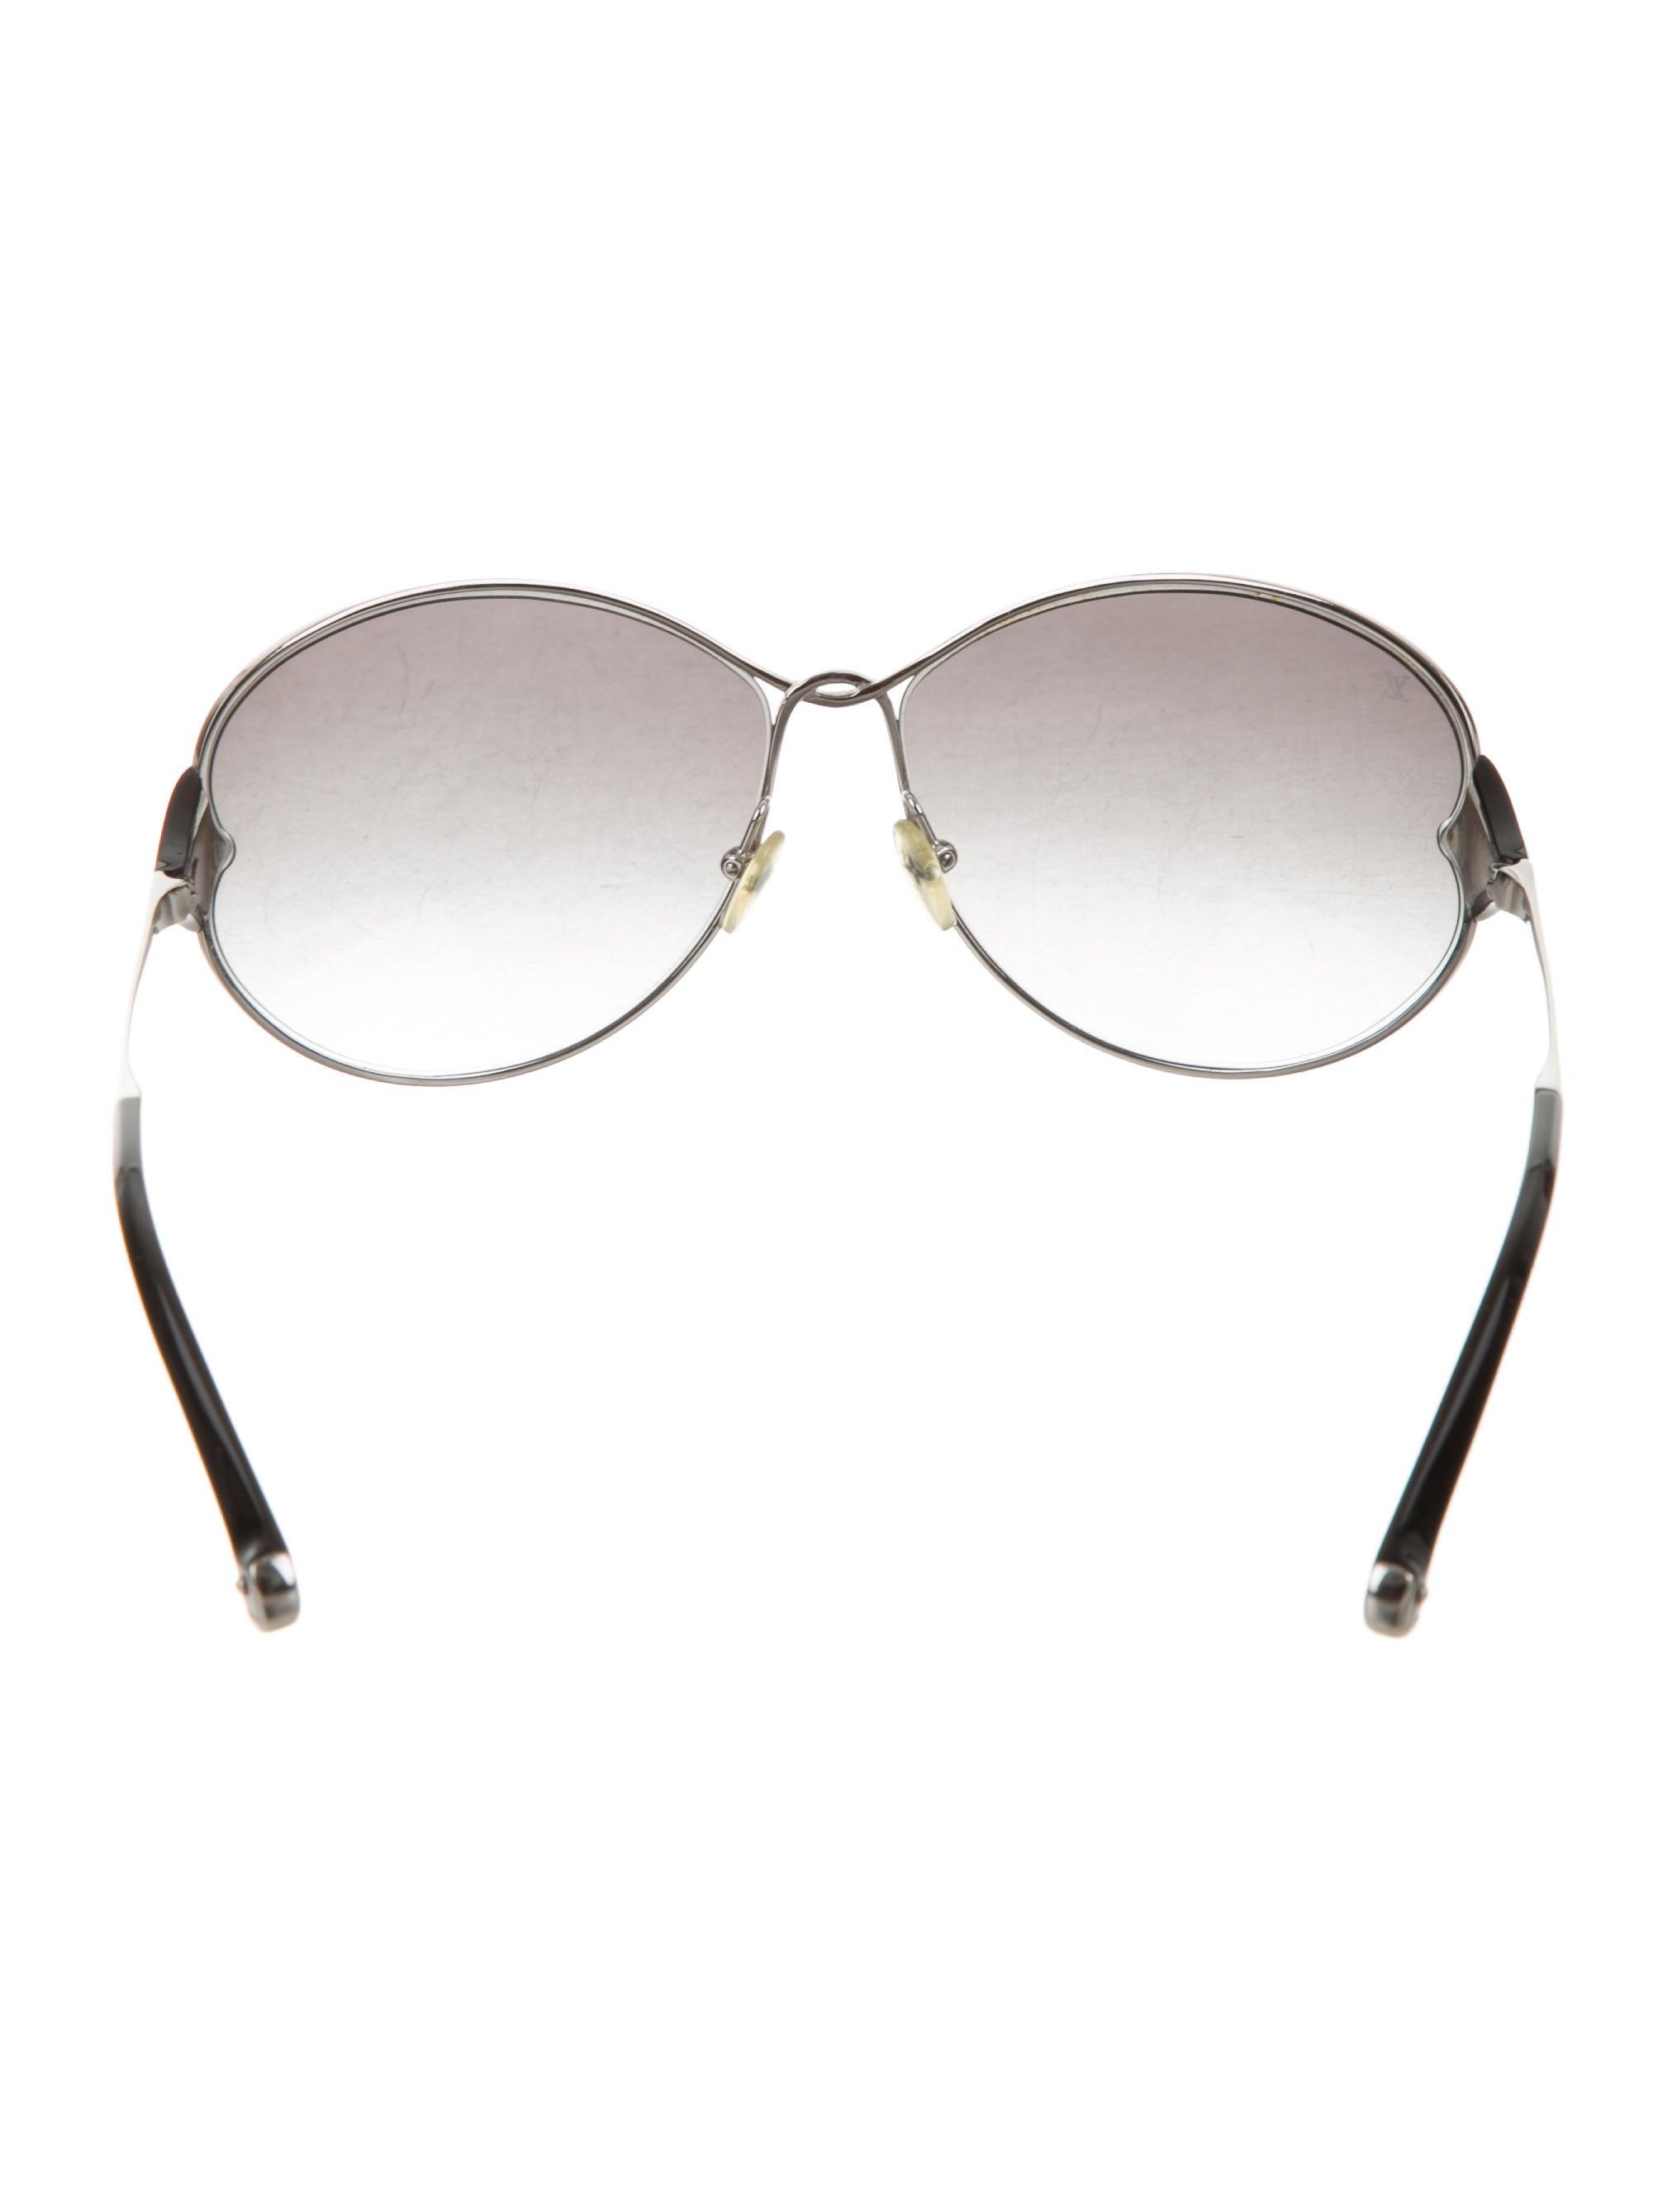 993c13b122bb Louis Vuitton Daisy Monogram Sunglasses - Accessories - LOU134193 ...